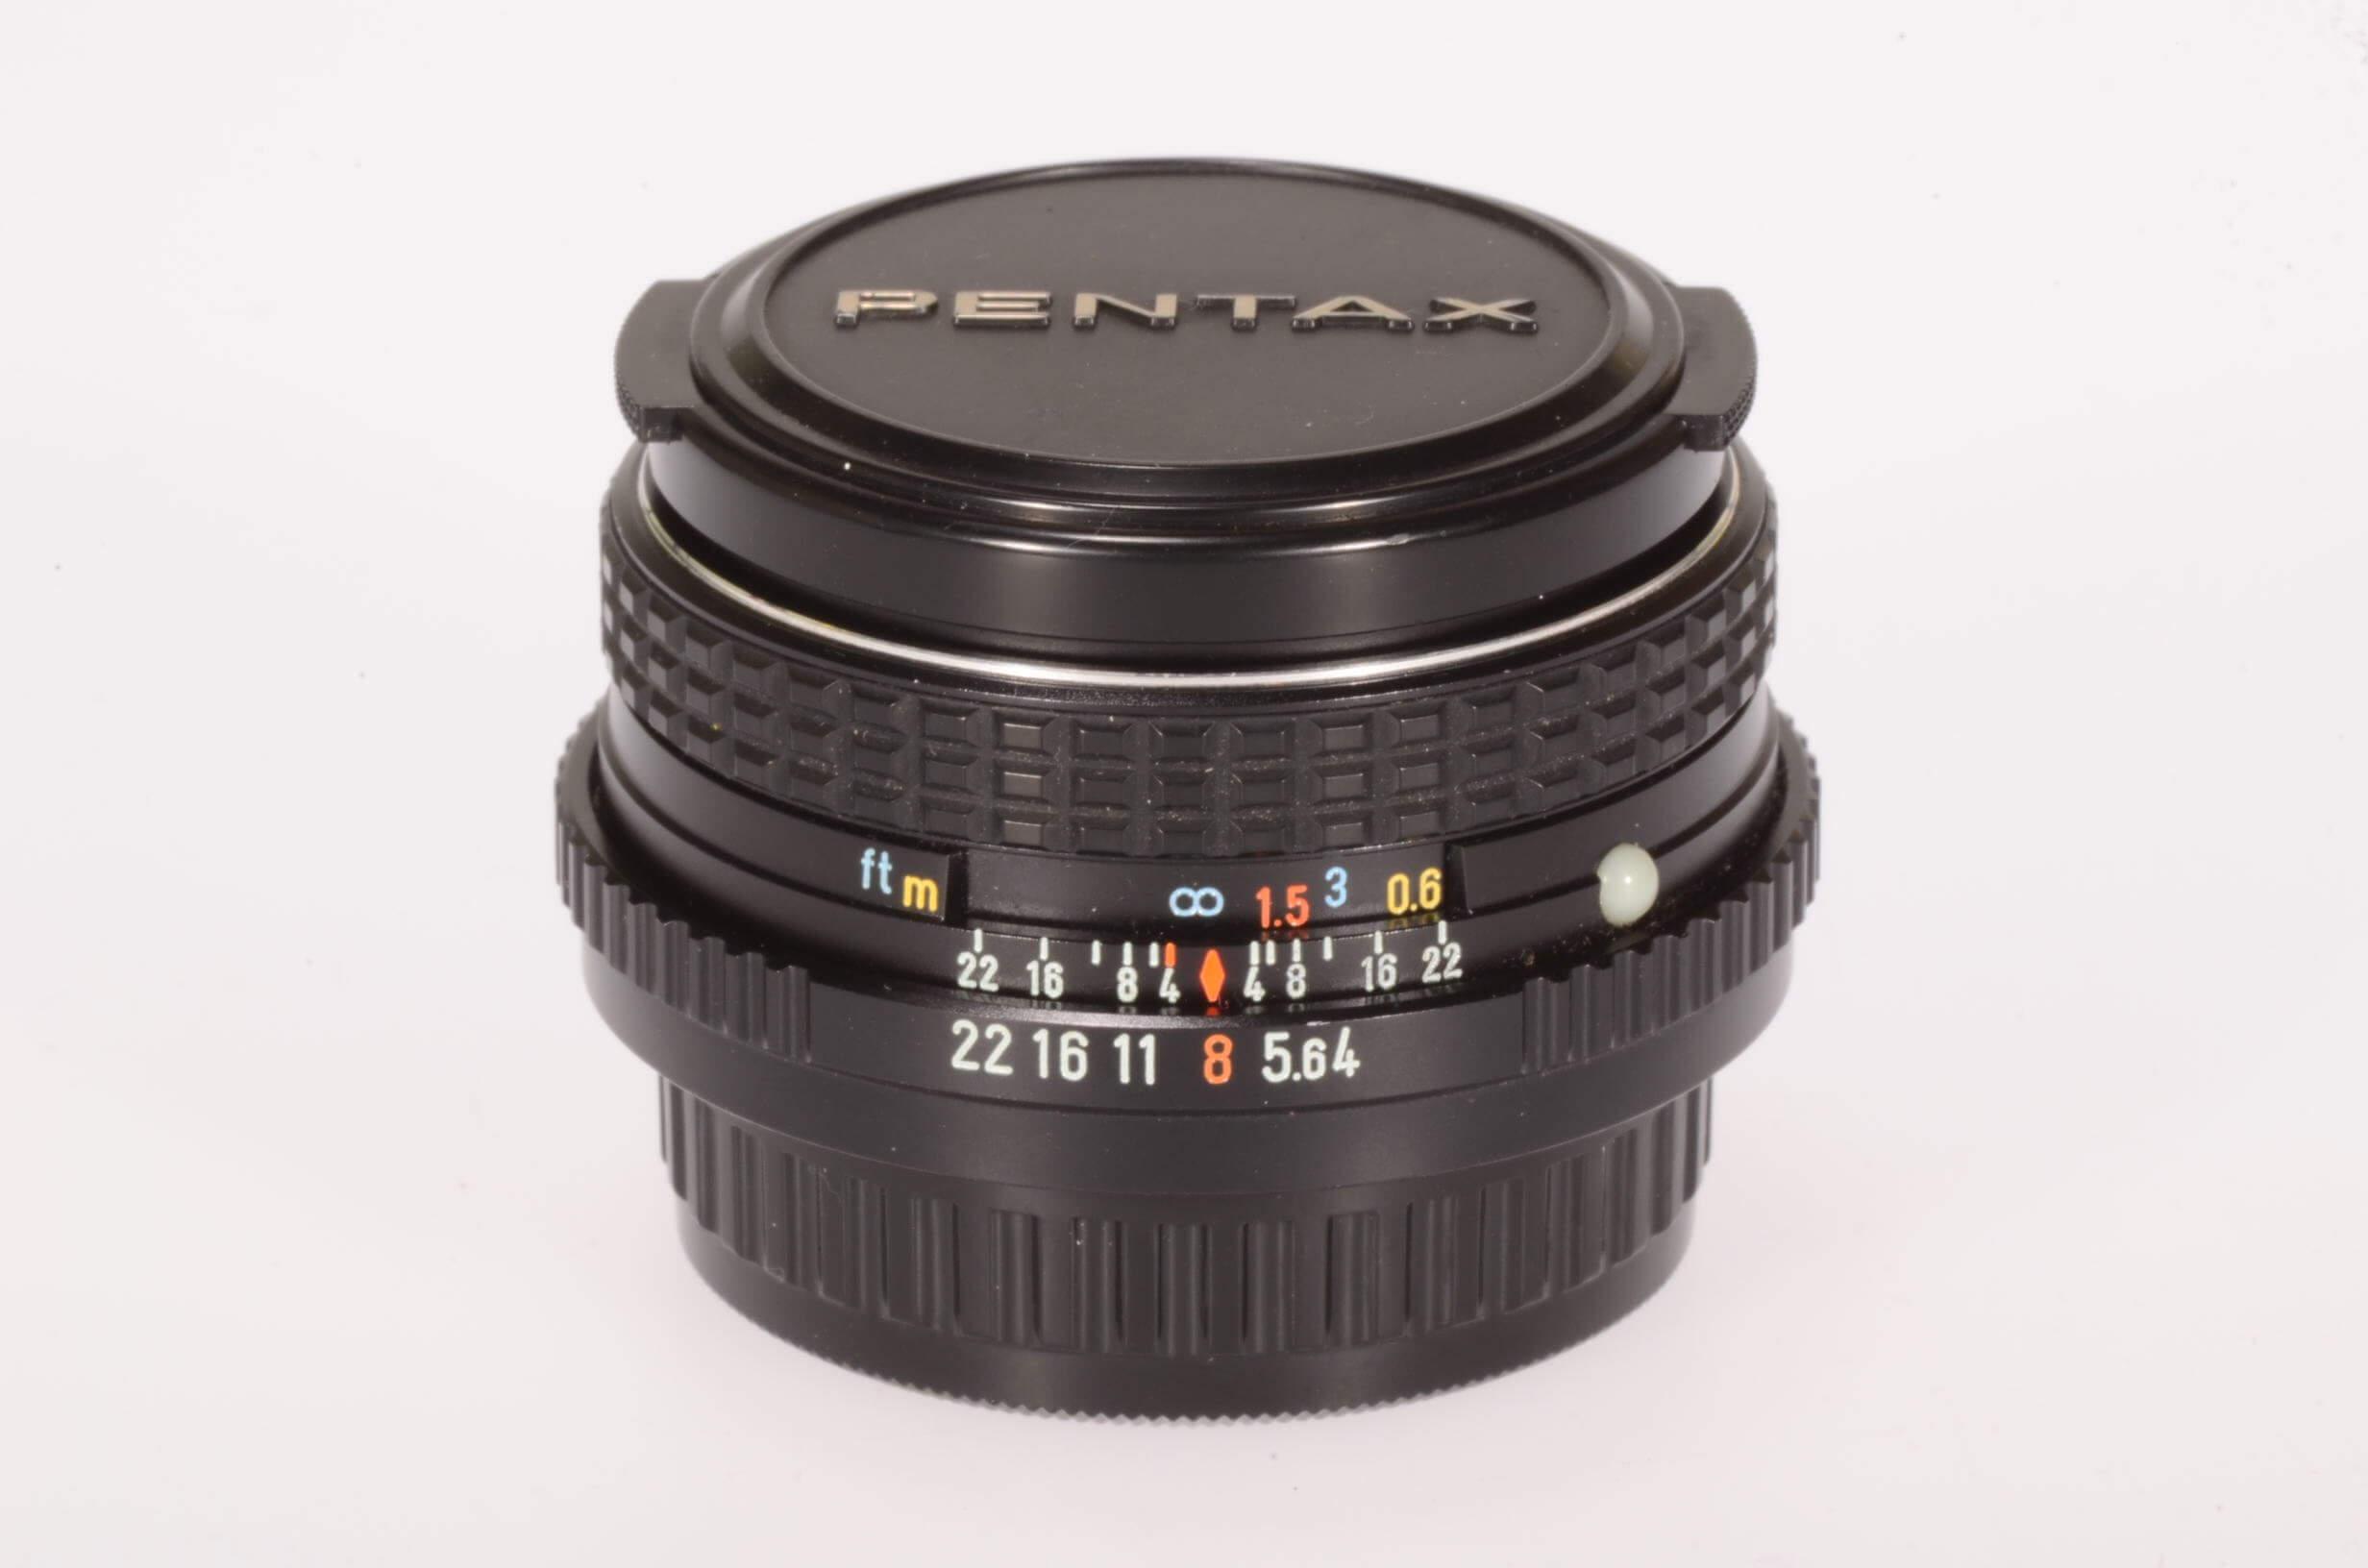 Pentax 20mm f4 lens, excellent condition